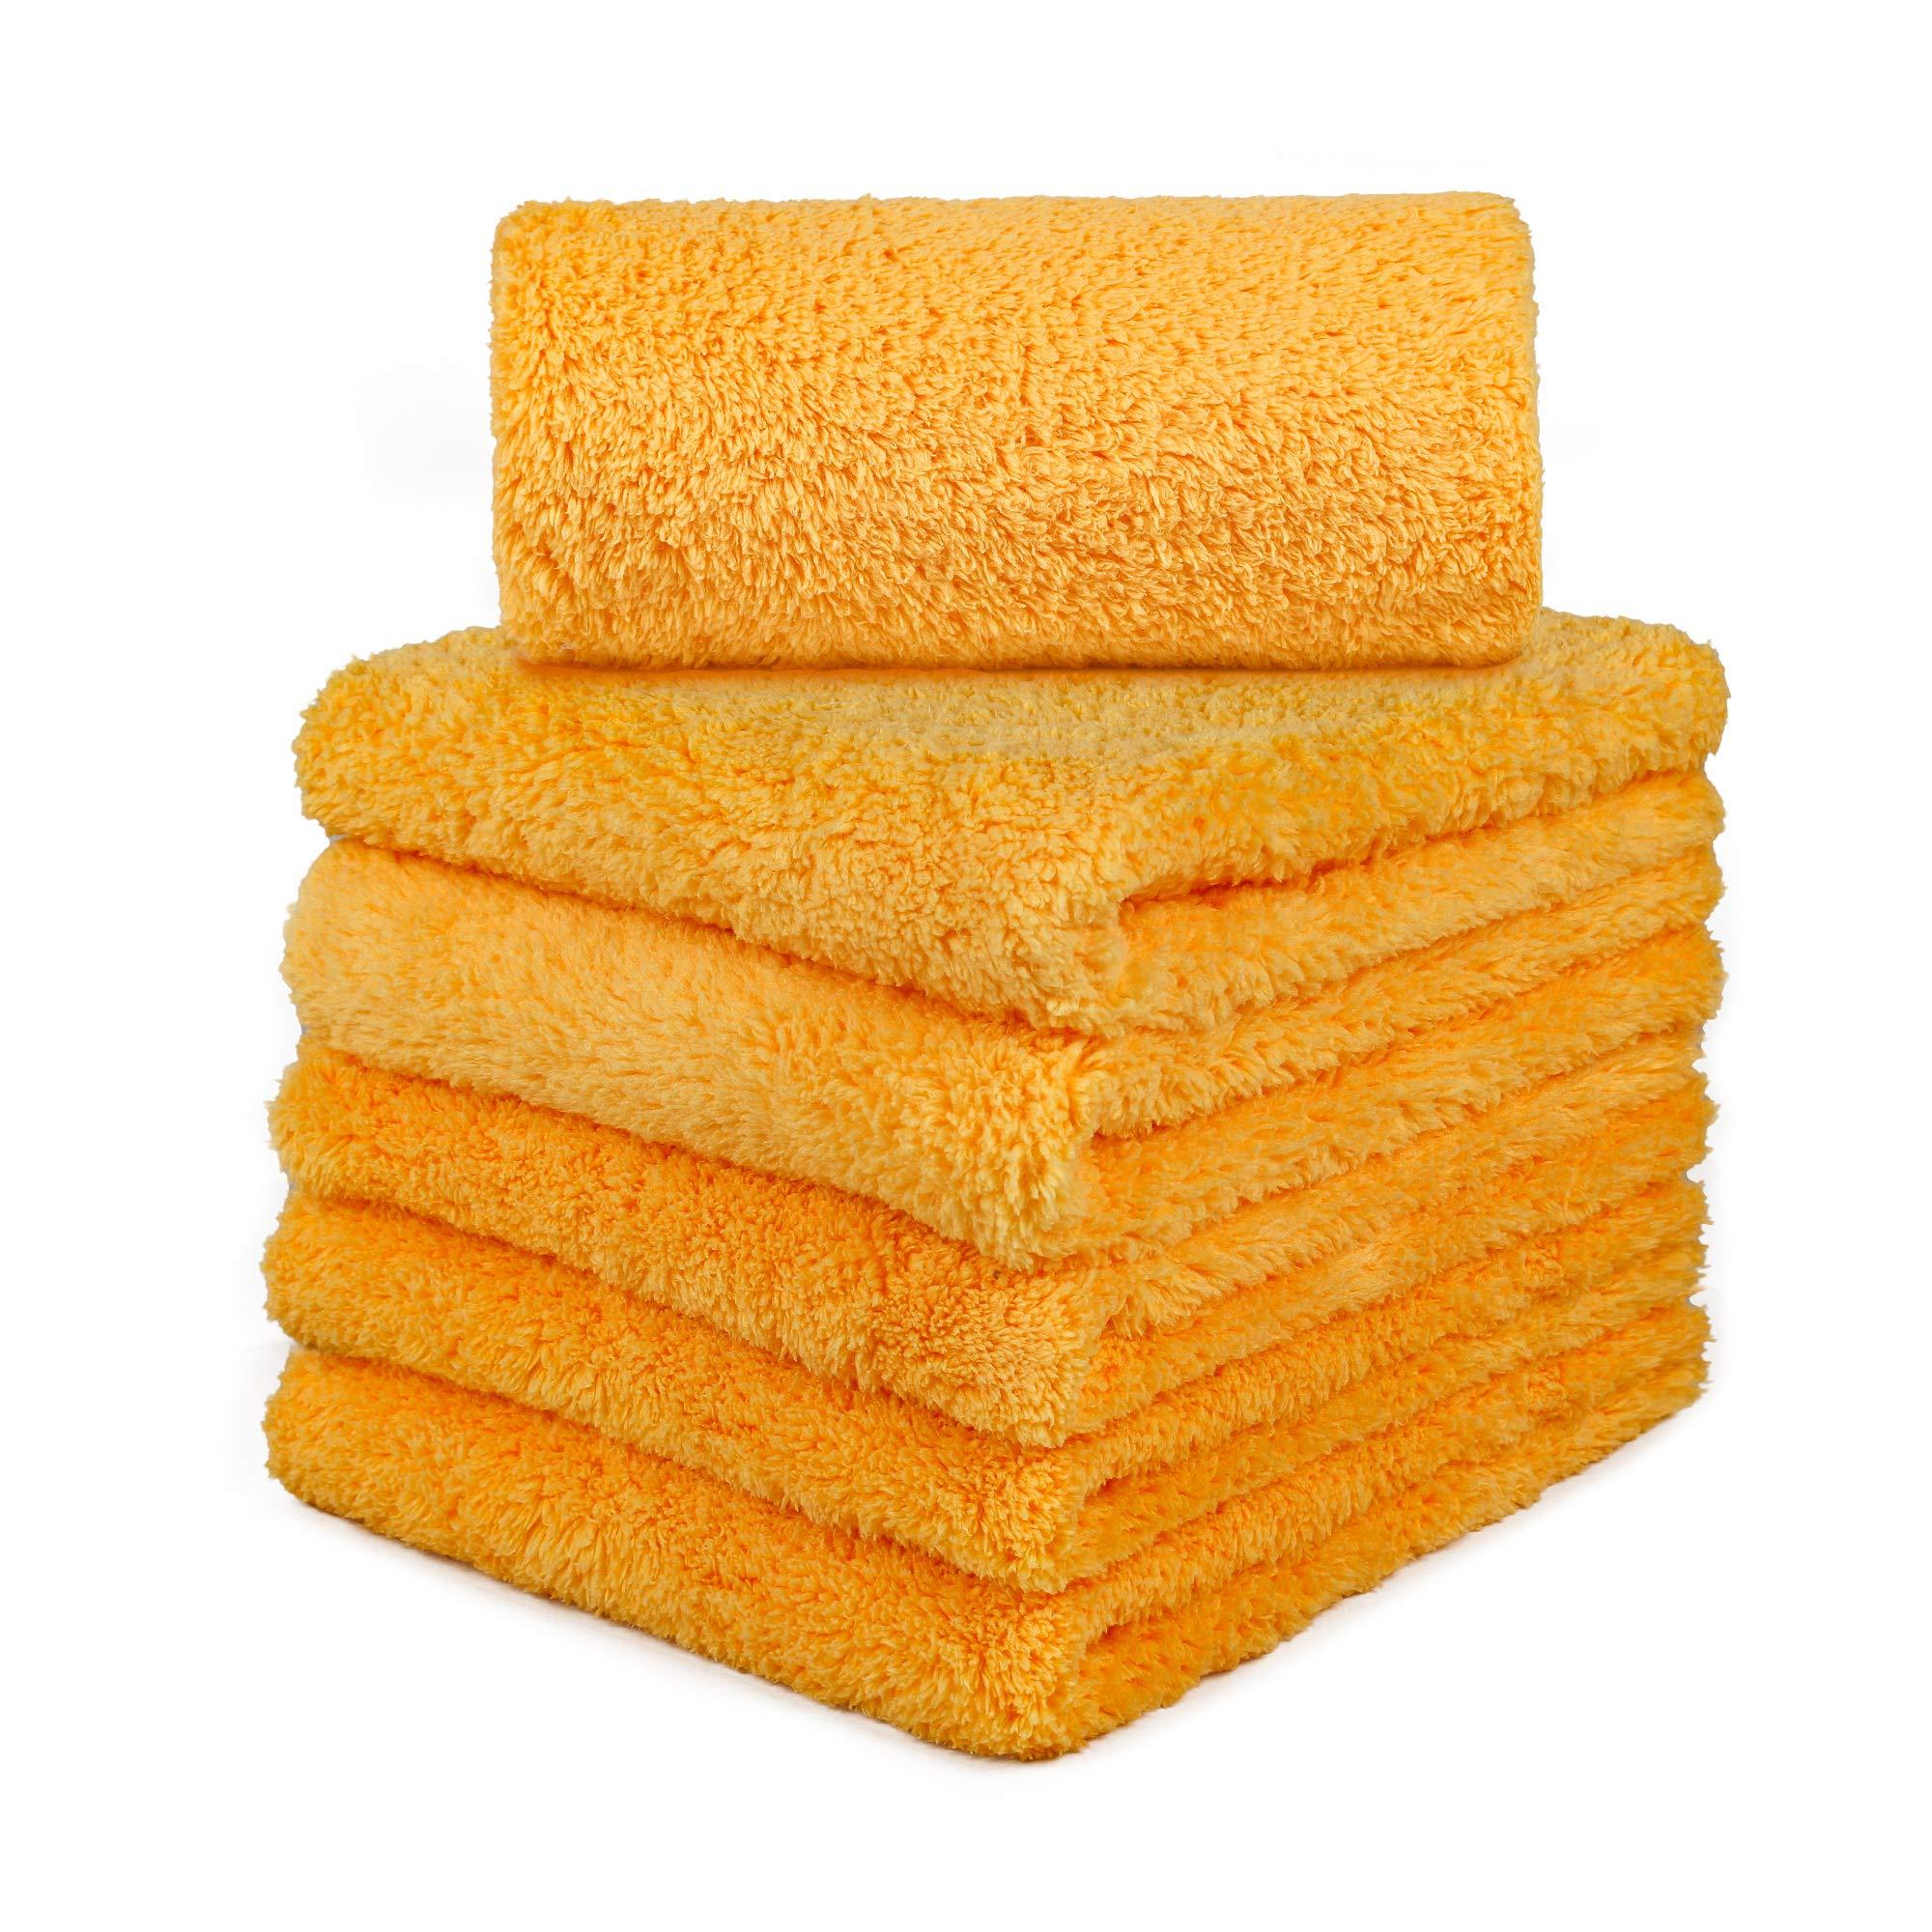 CARCAREZ Microfiber Car Wash Drying Towels Professional Grade Premium Microfiber Towels for Car Wash Drying 16 in.x 16 in. Pack of 6